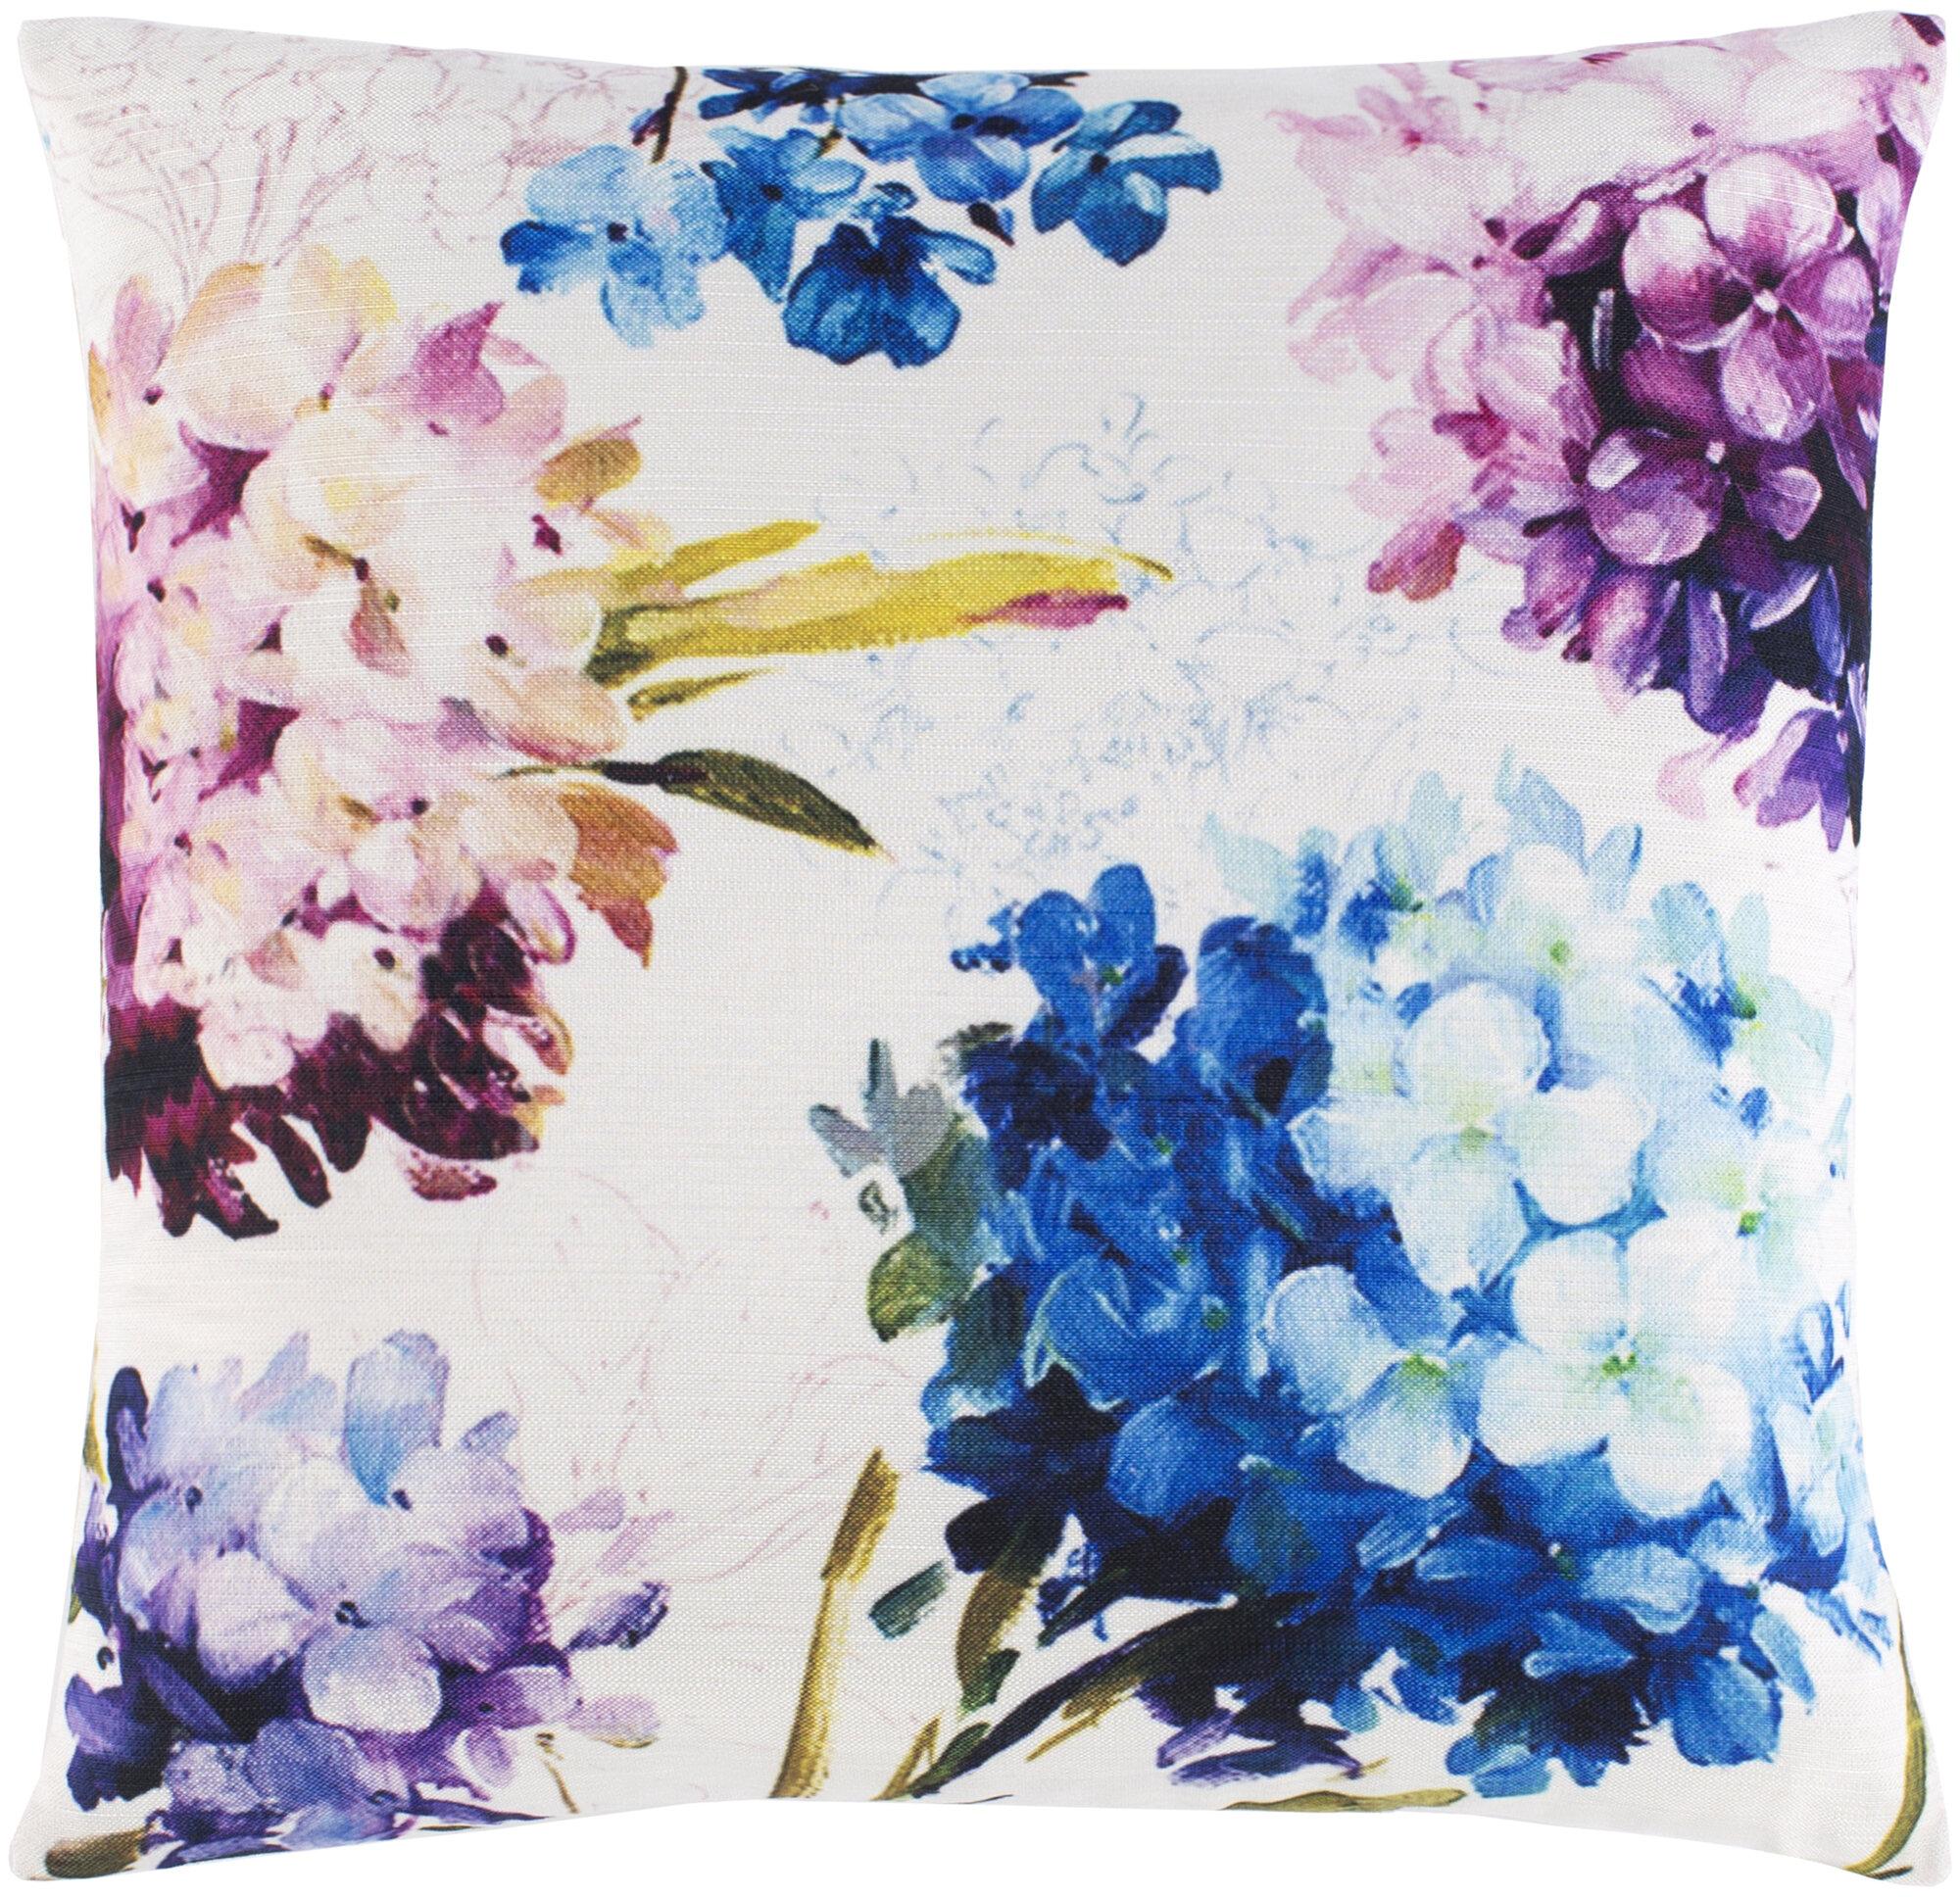 Red Barrel Studio Orsay Perenial Floral Throw Pillow Cover Wayfair